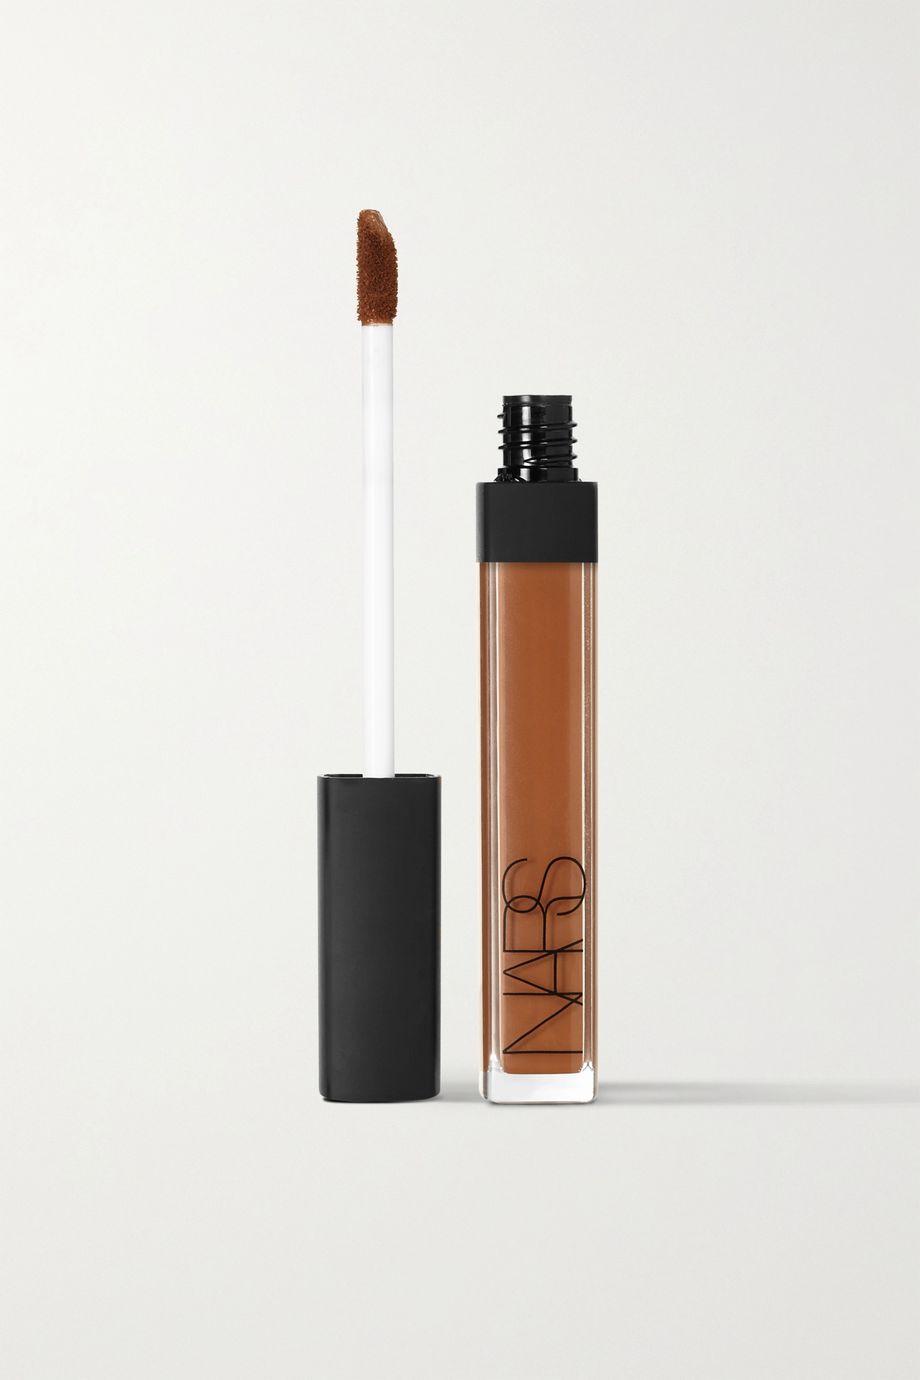 NARS Radiant Creamy Concealer - Amande, 6ml